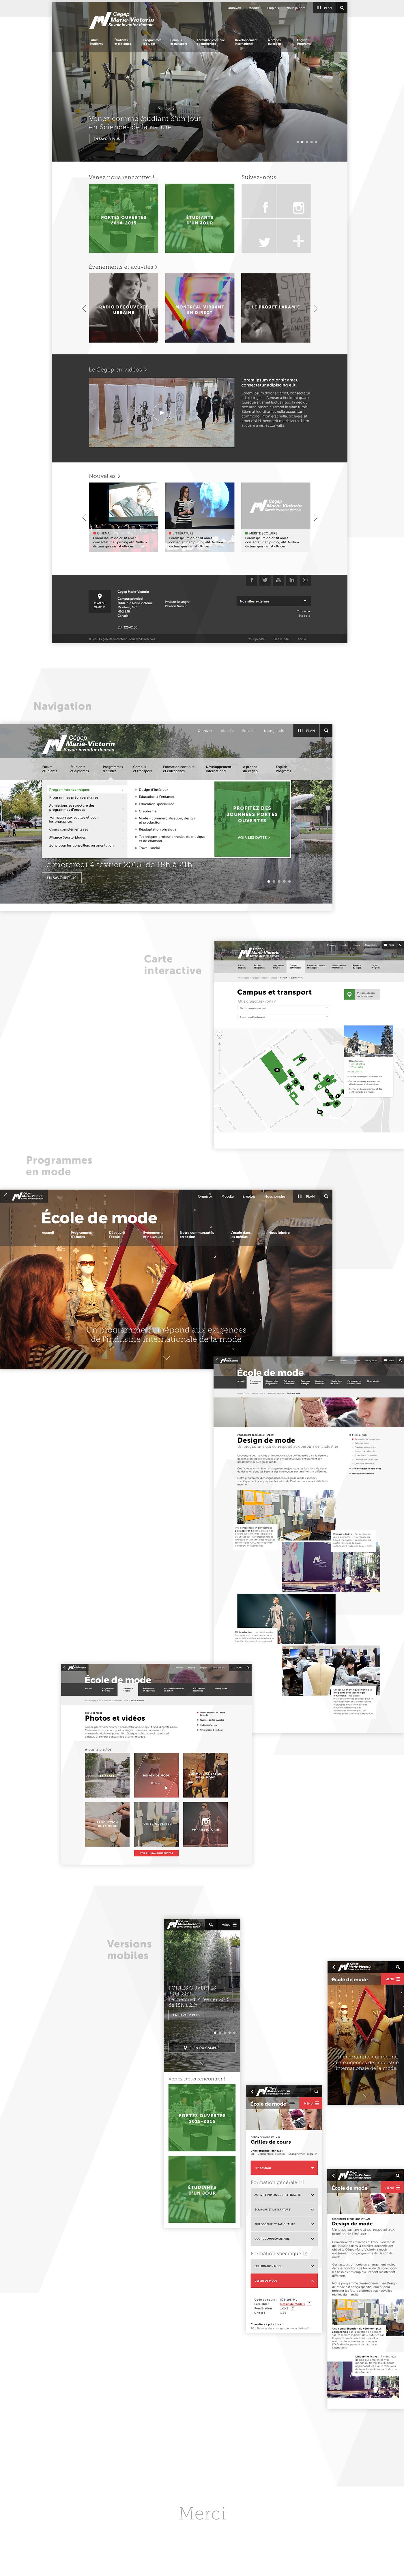 cégep school enseignement Etude formation programme Quebec Montreal